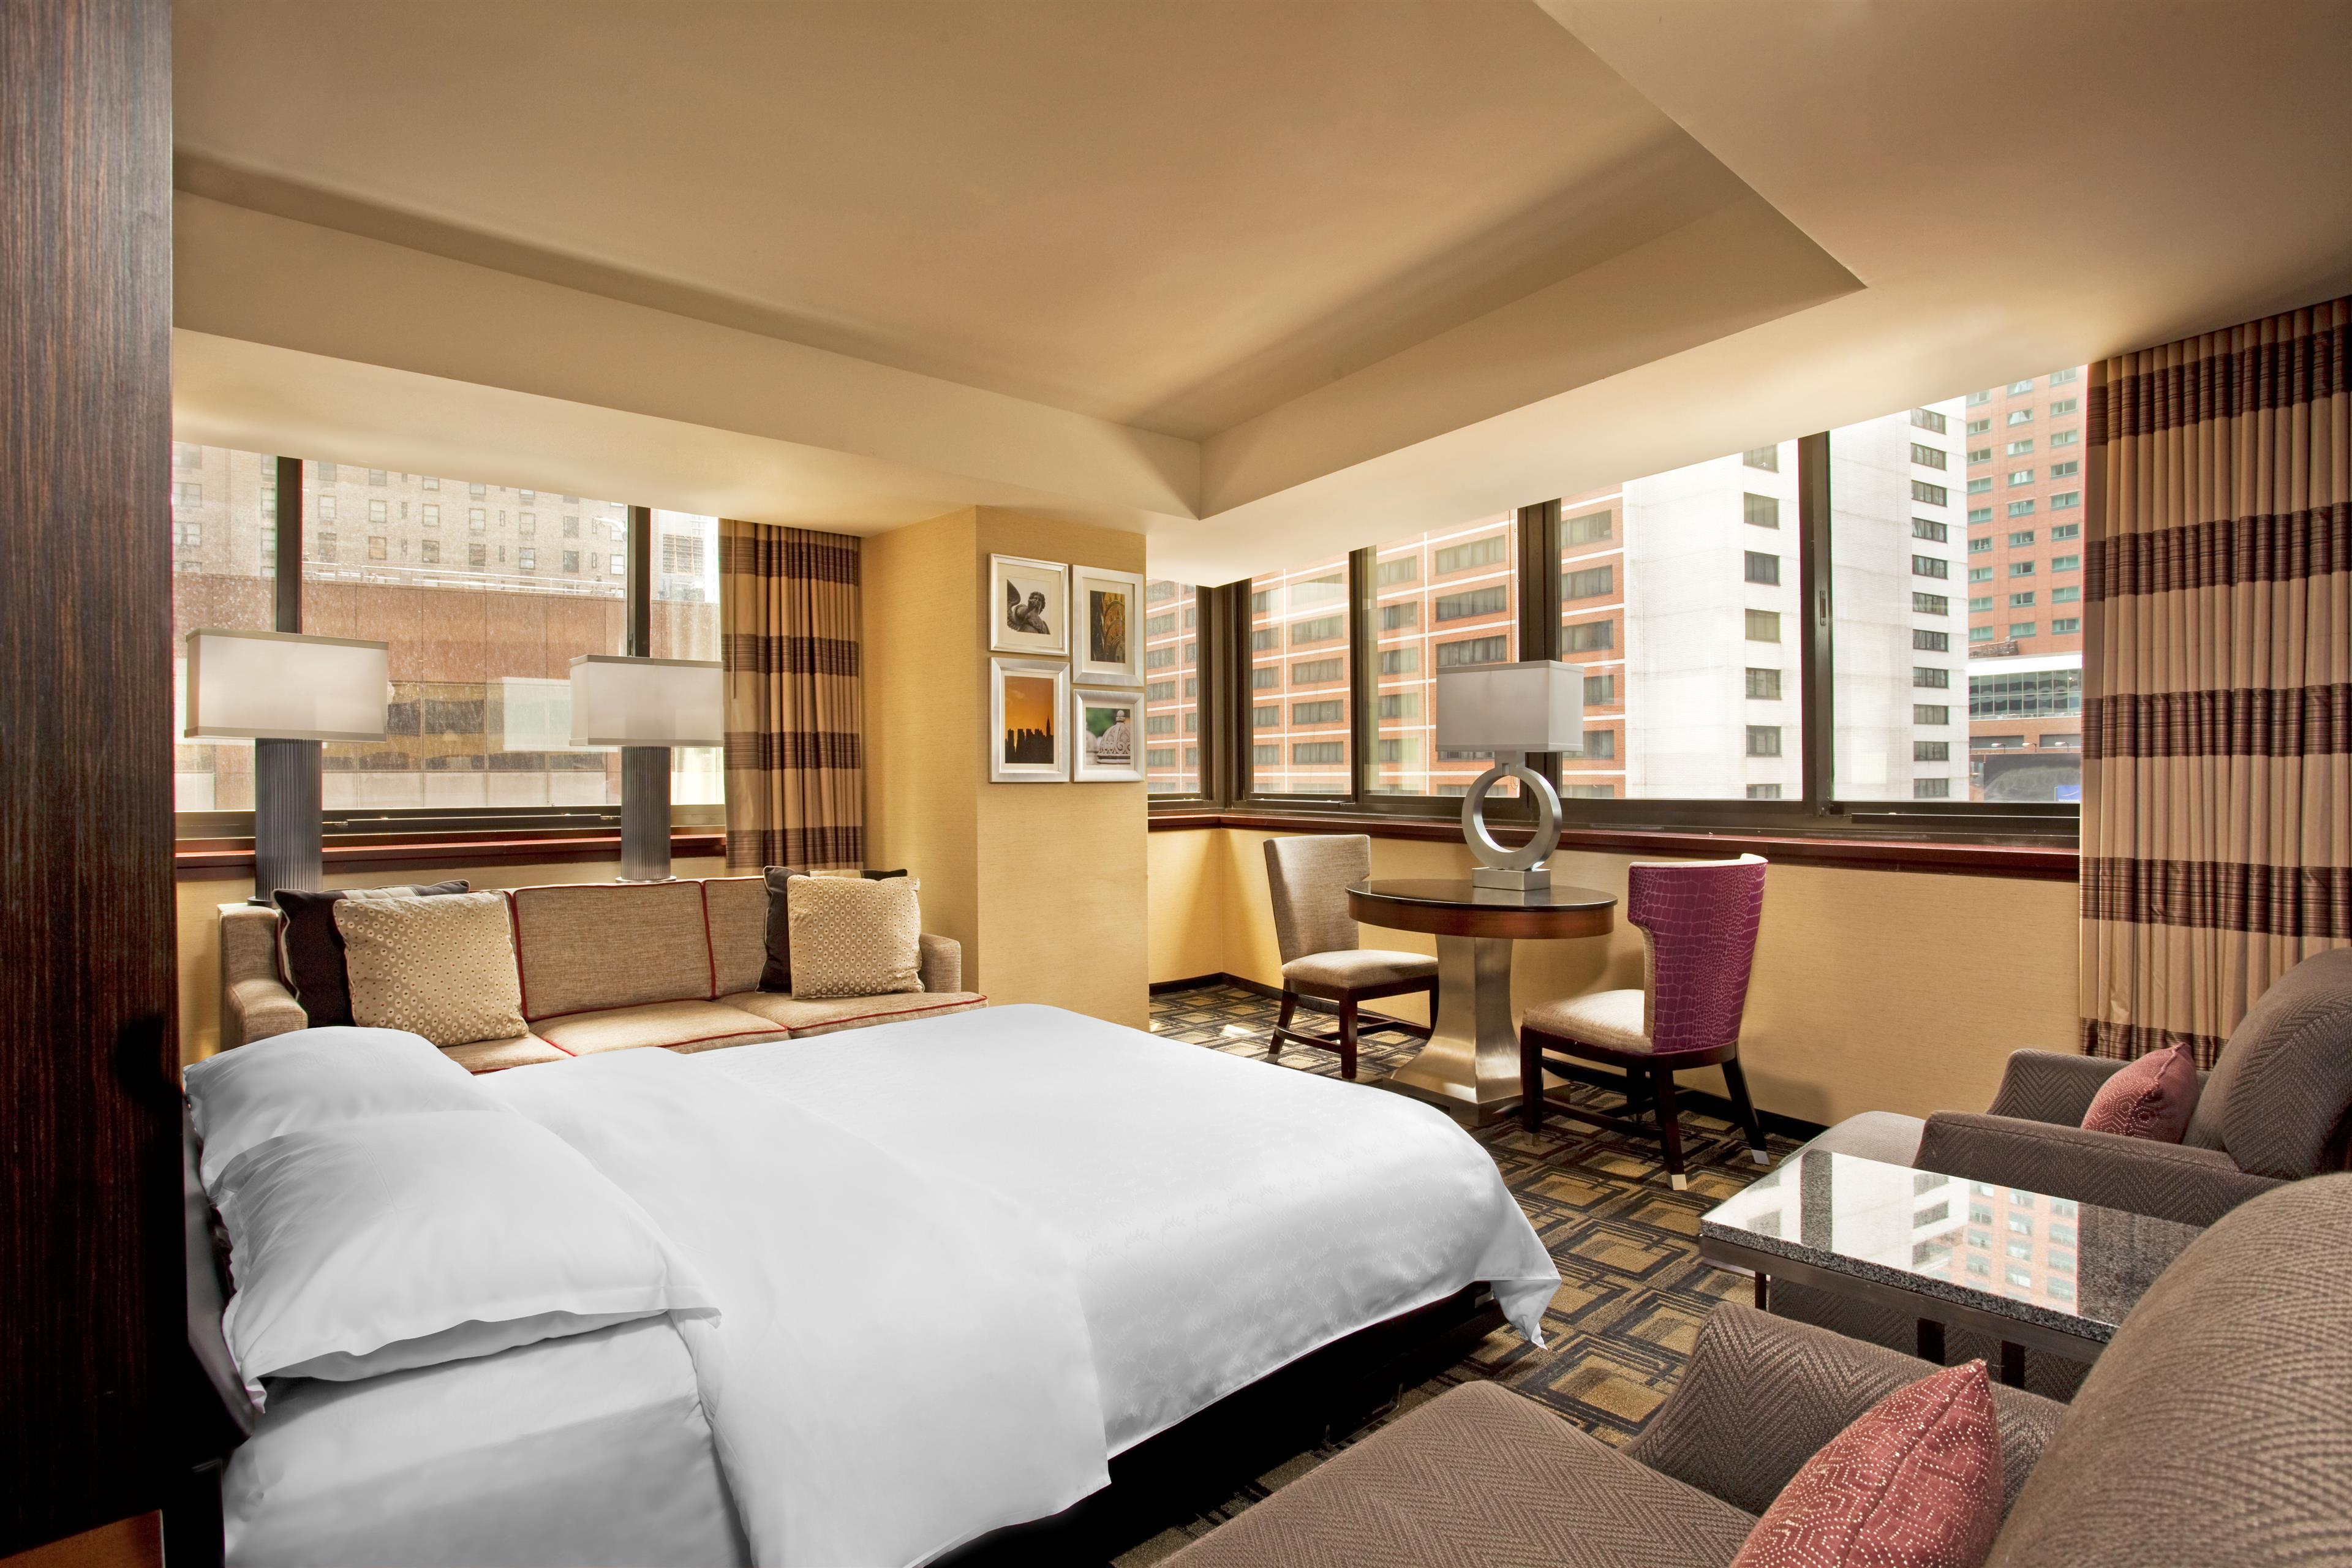 Sheraton New York Times Square Hotel image 1